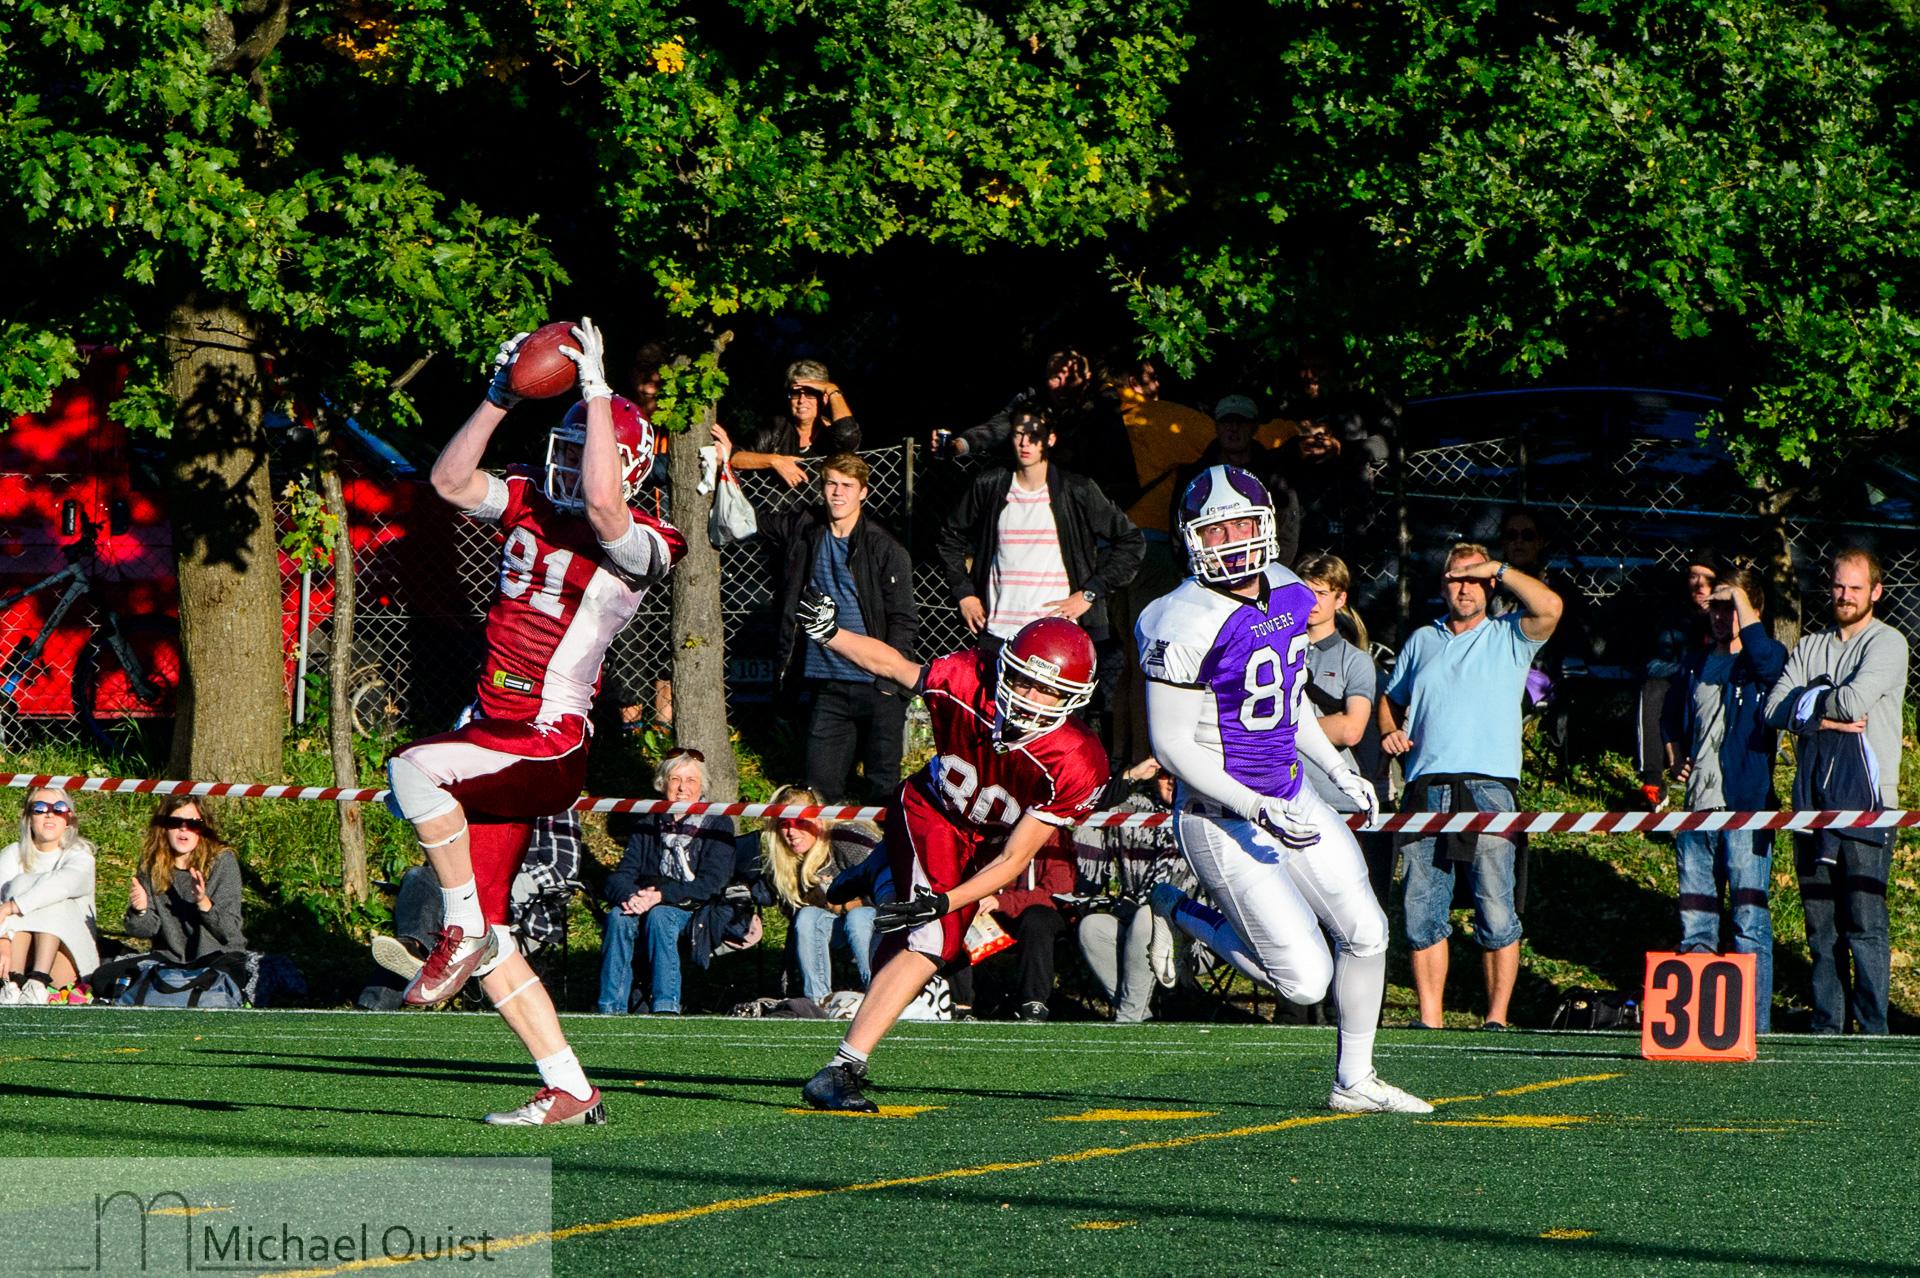 Junior-Bowl-2015-Copenhagen-Towers-vs-Herlev-Rebels-49